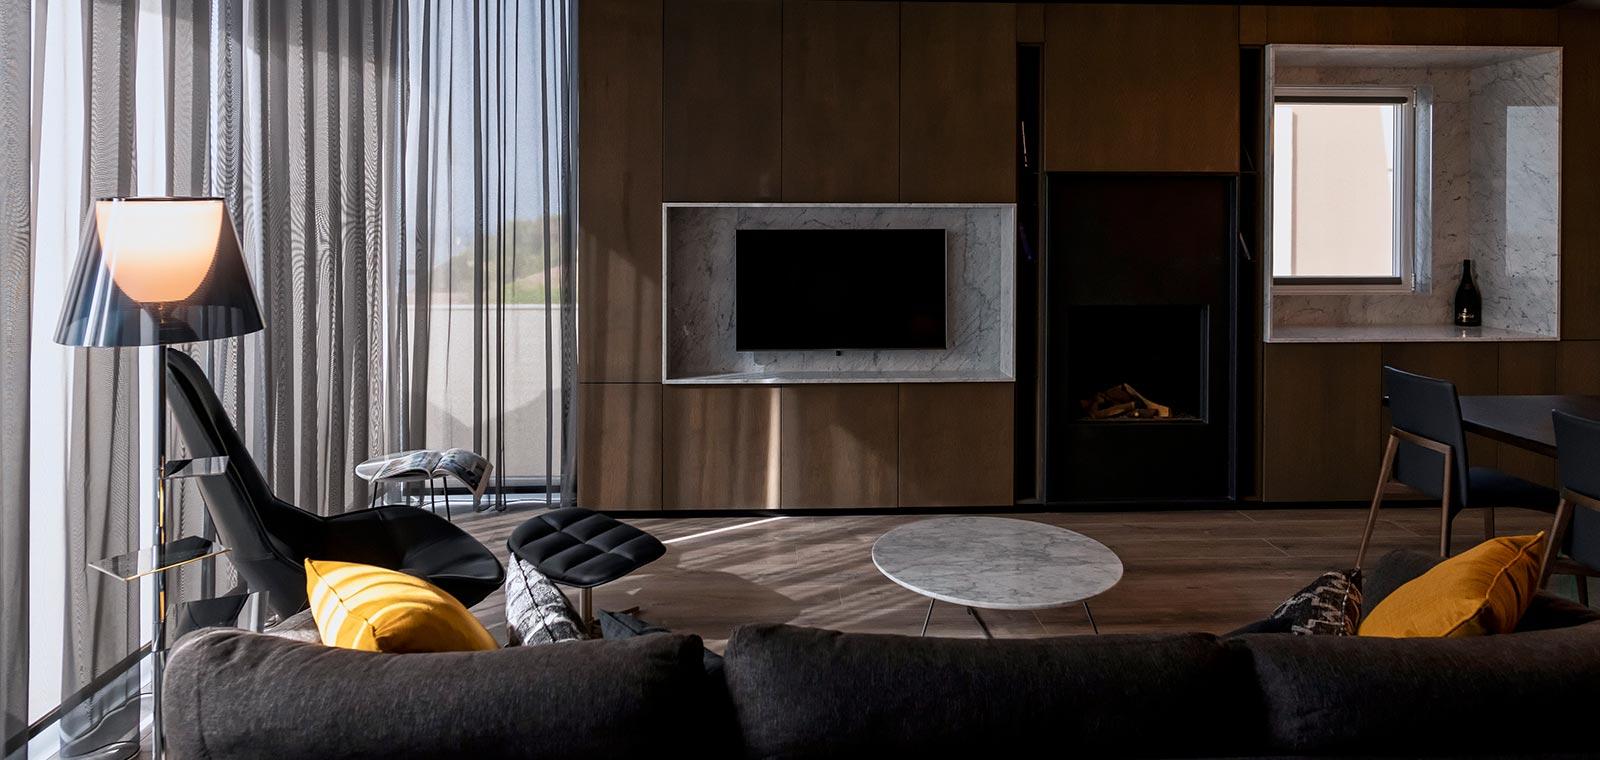 Modern living room design in a beautiful home located in Malta